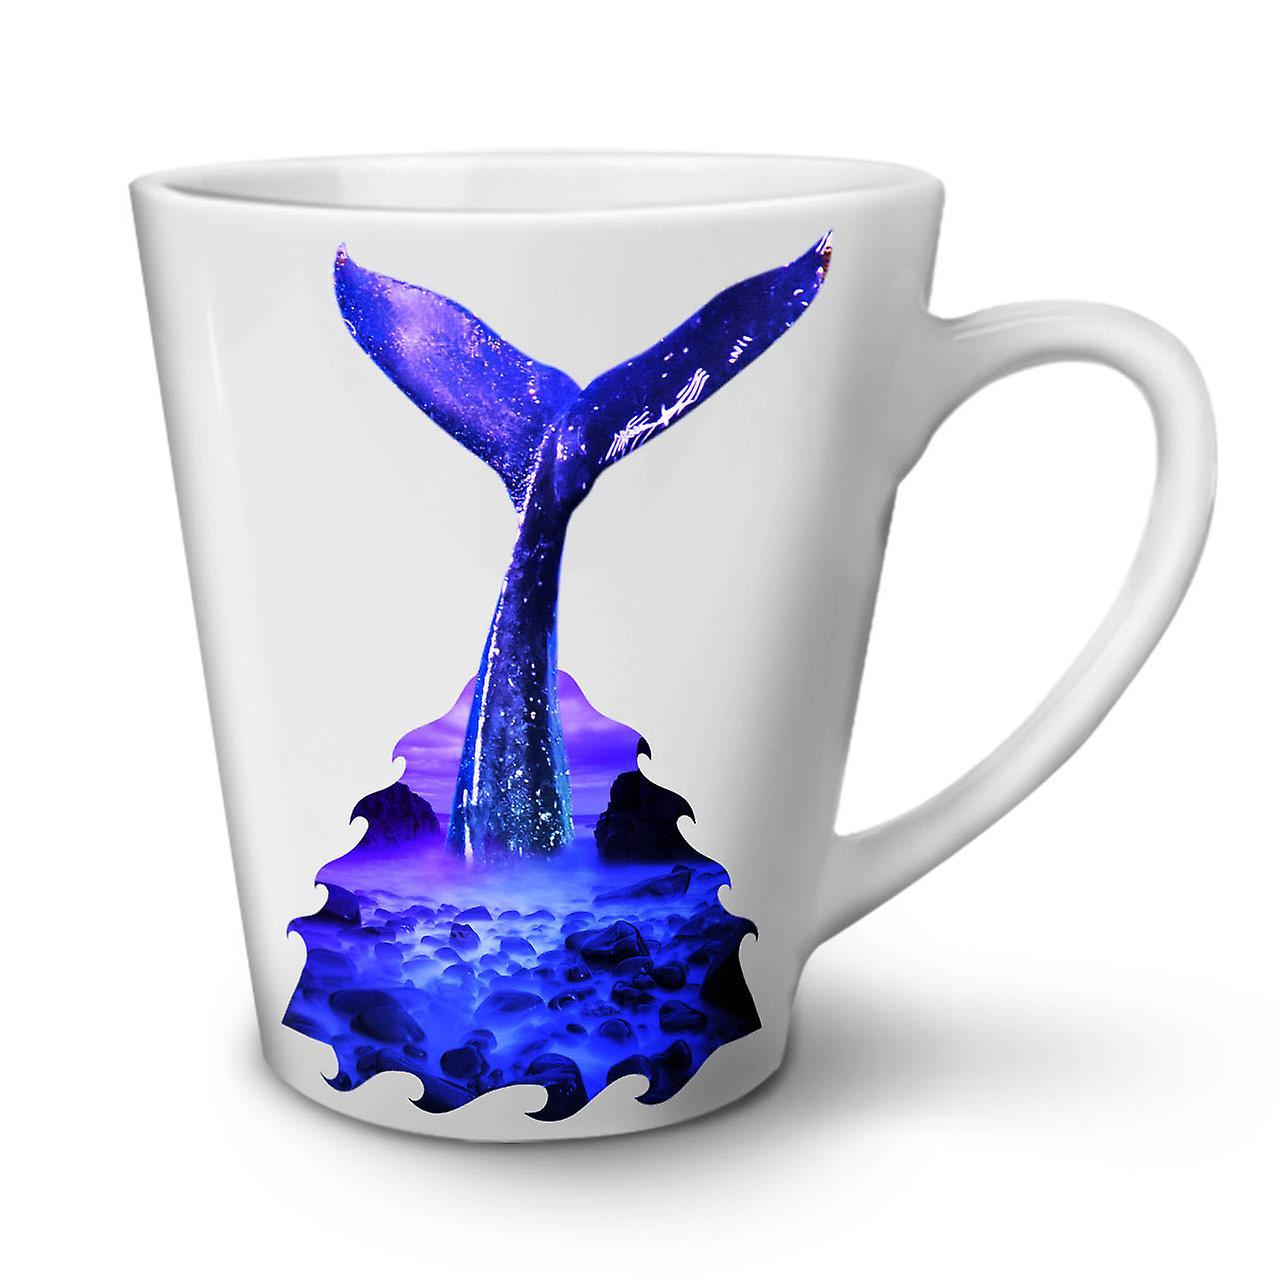 OzWellcoda Tasse Céramique Latte Plongée En 12 Nouvelle Bleue Café Blanche Baleine W9bDe2IEYH